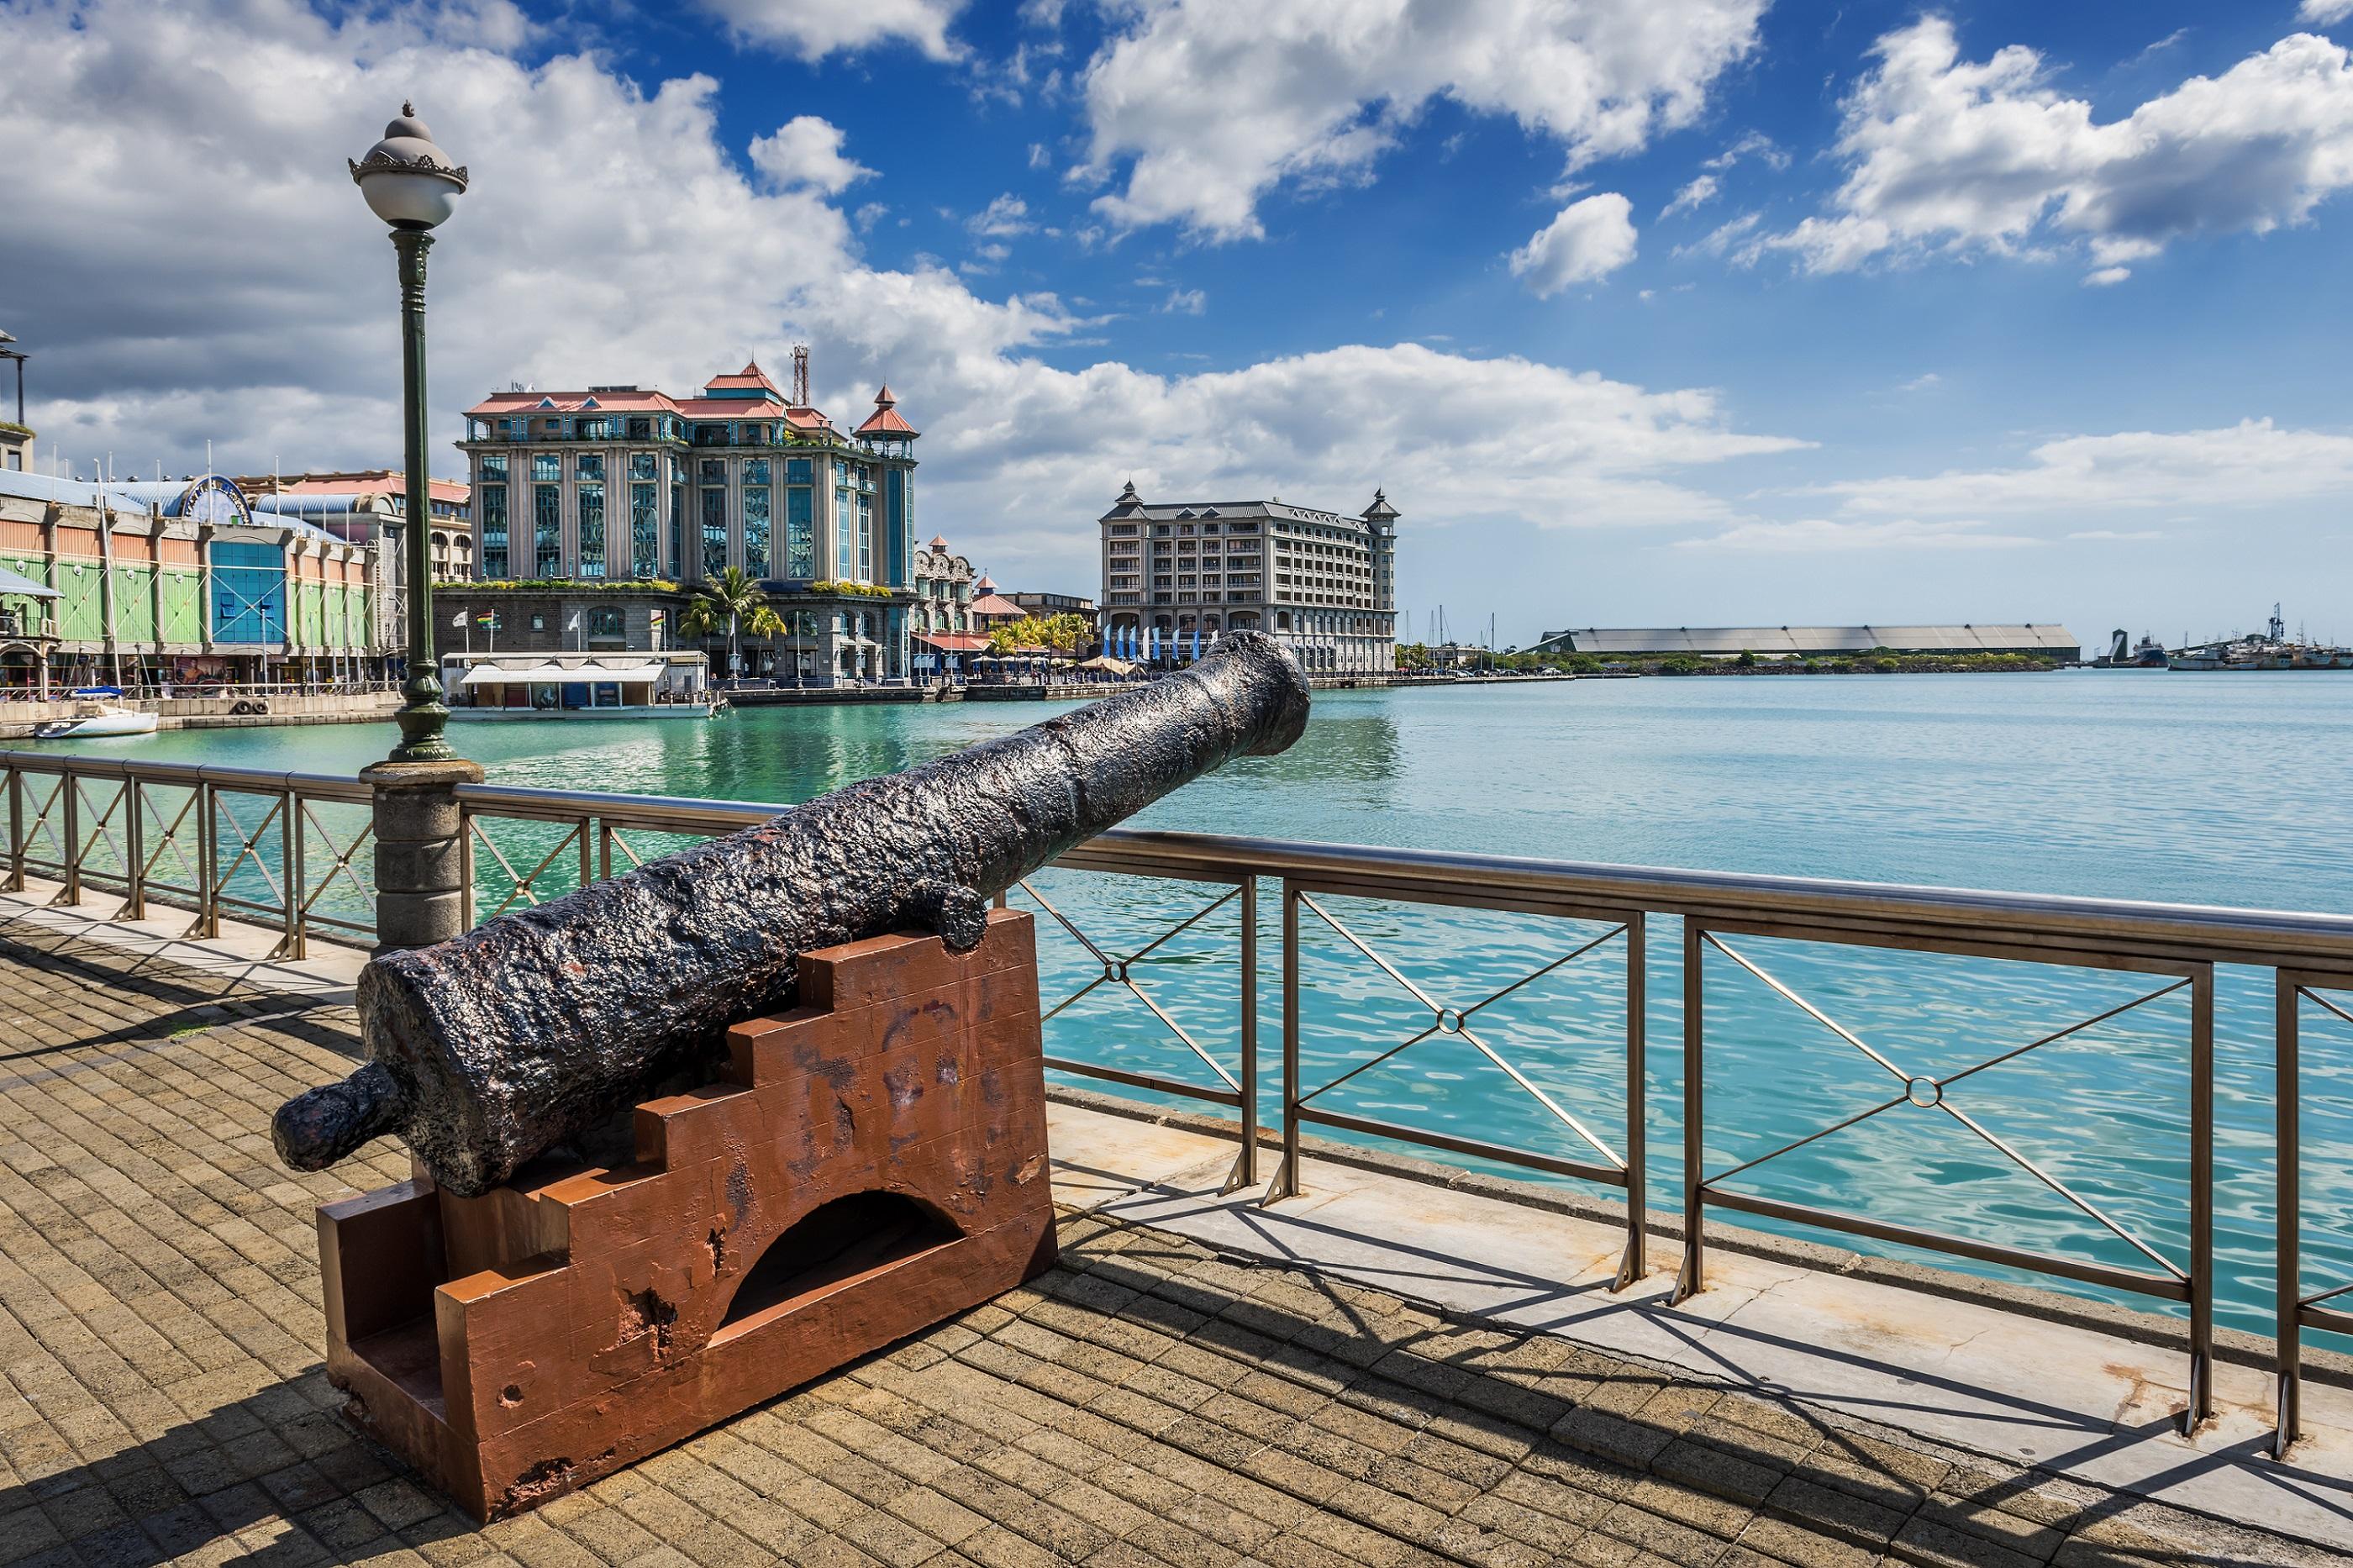 Port louis entdeckt mauritius 39 faszinierende hauptstadt - Restaurants in port louis mauritius ...